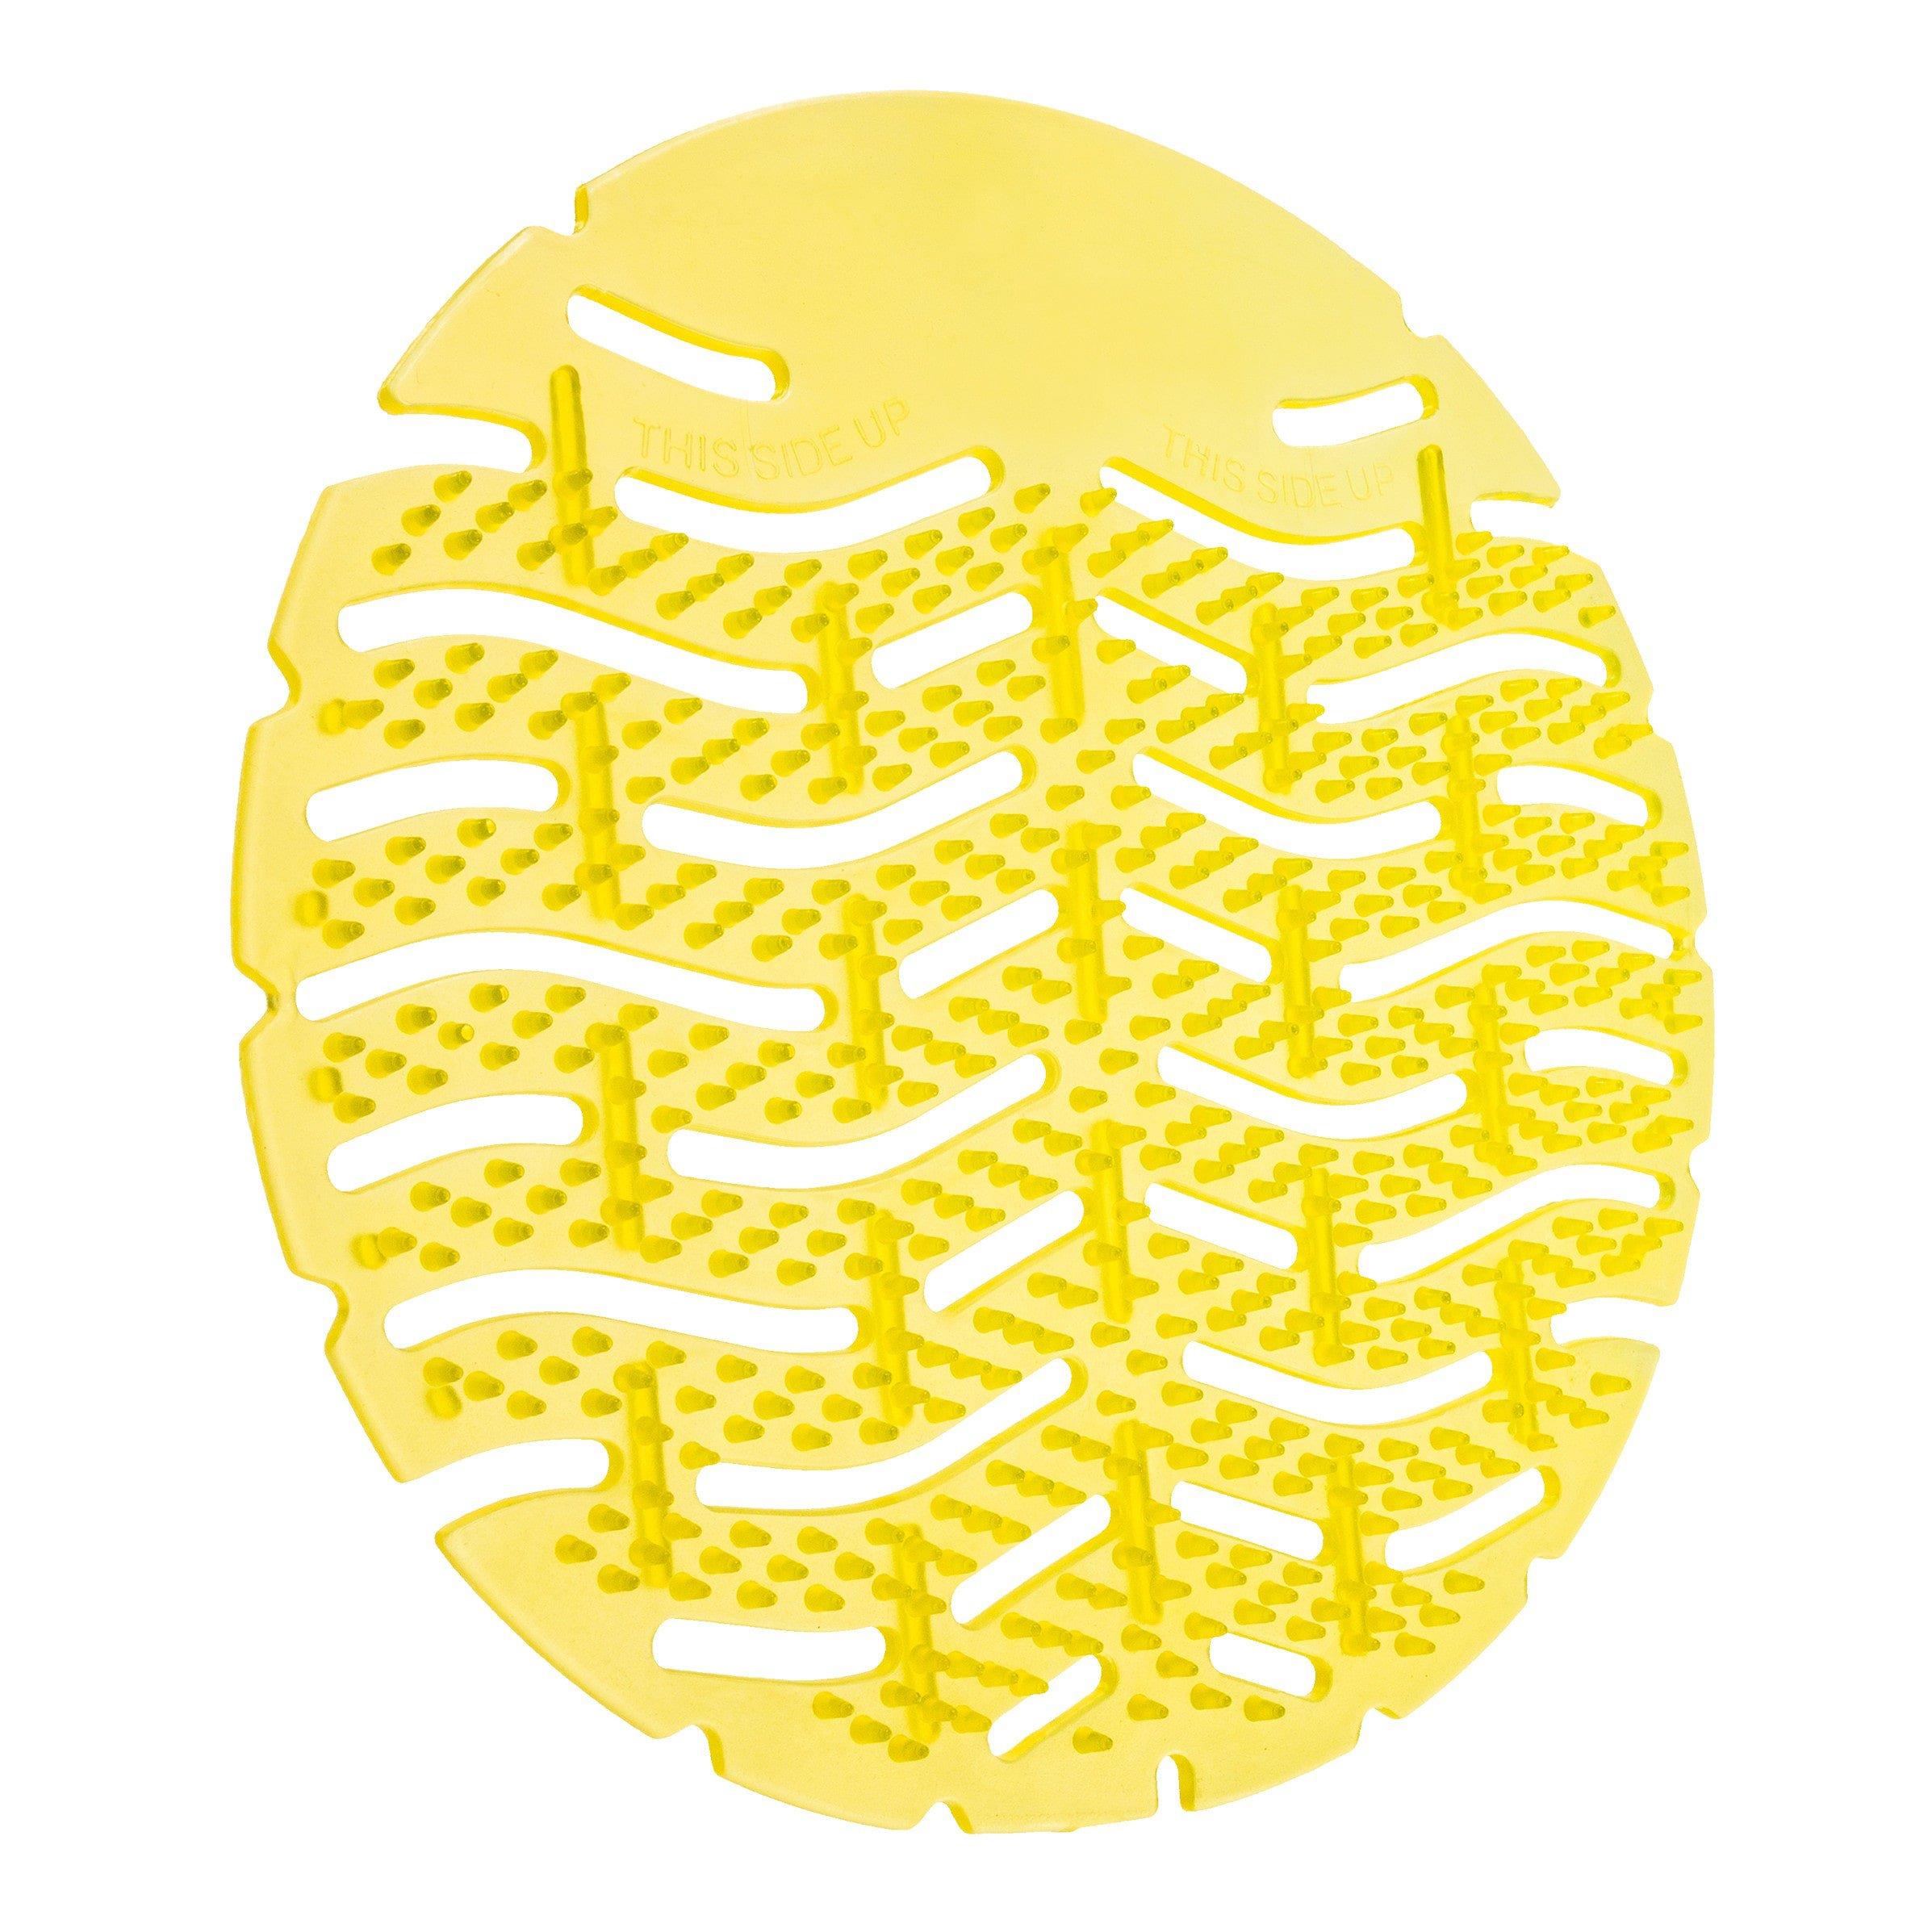 Euro Products Urinoirmat | Lemon Geel | Met antispat haartjes | 10 stuks